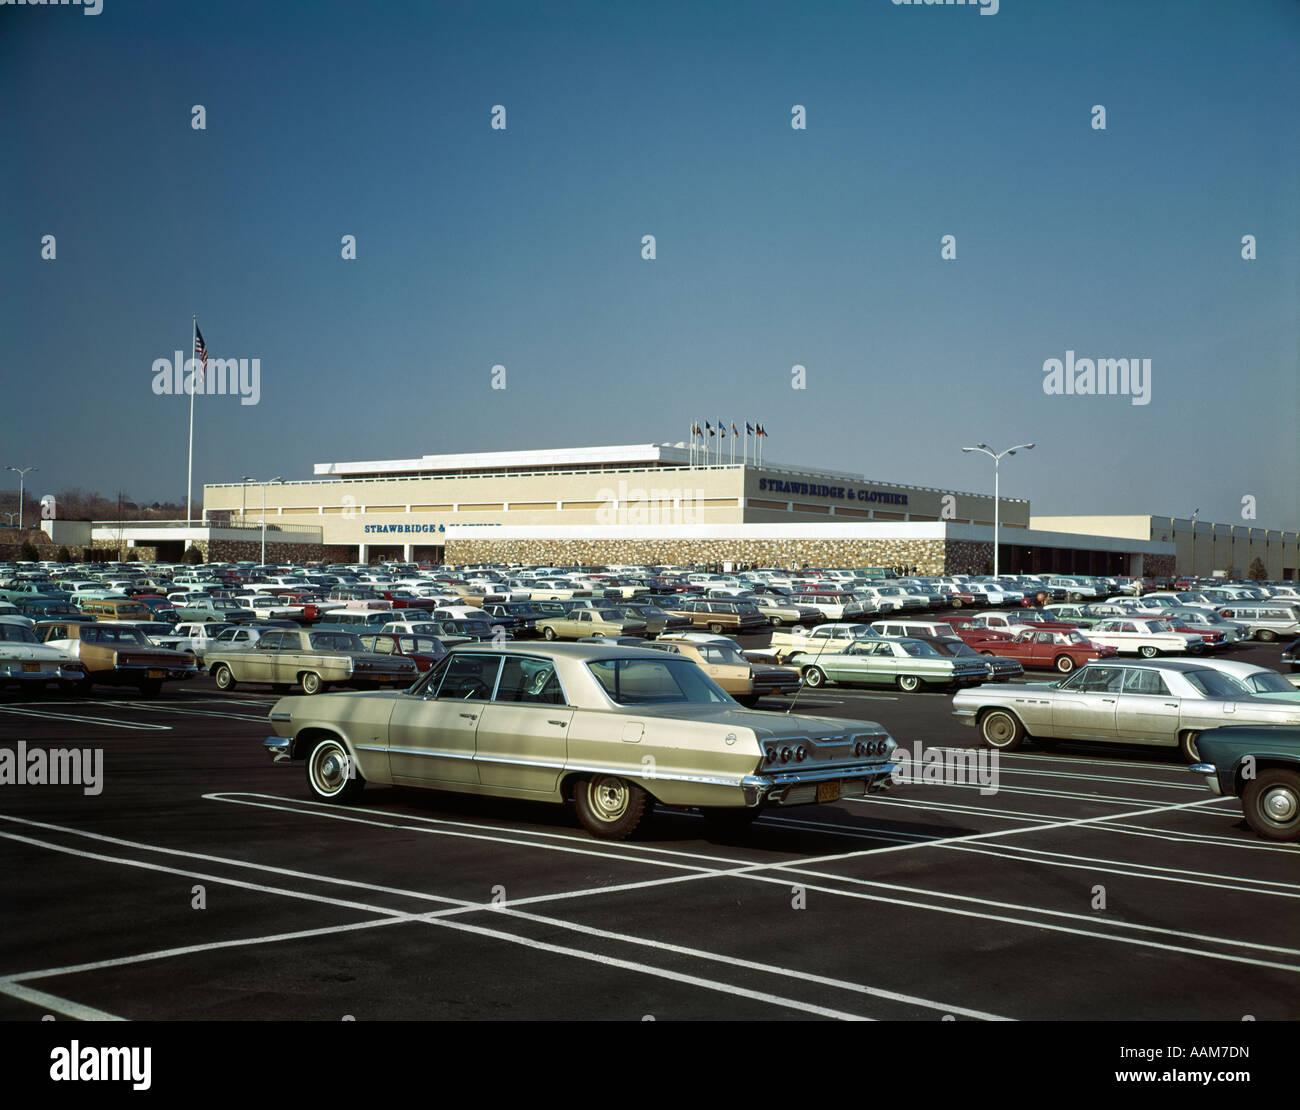 1960s full parking lot of strawbridge clothier department store 1960s full parking lot of strawbridge clothier department store shopping outdoor